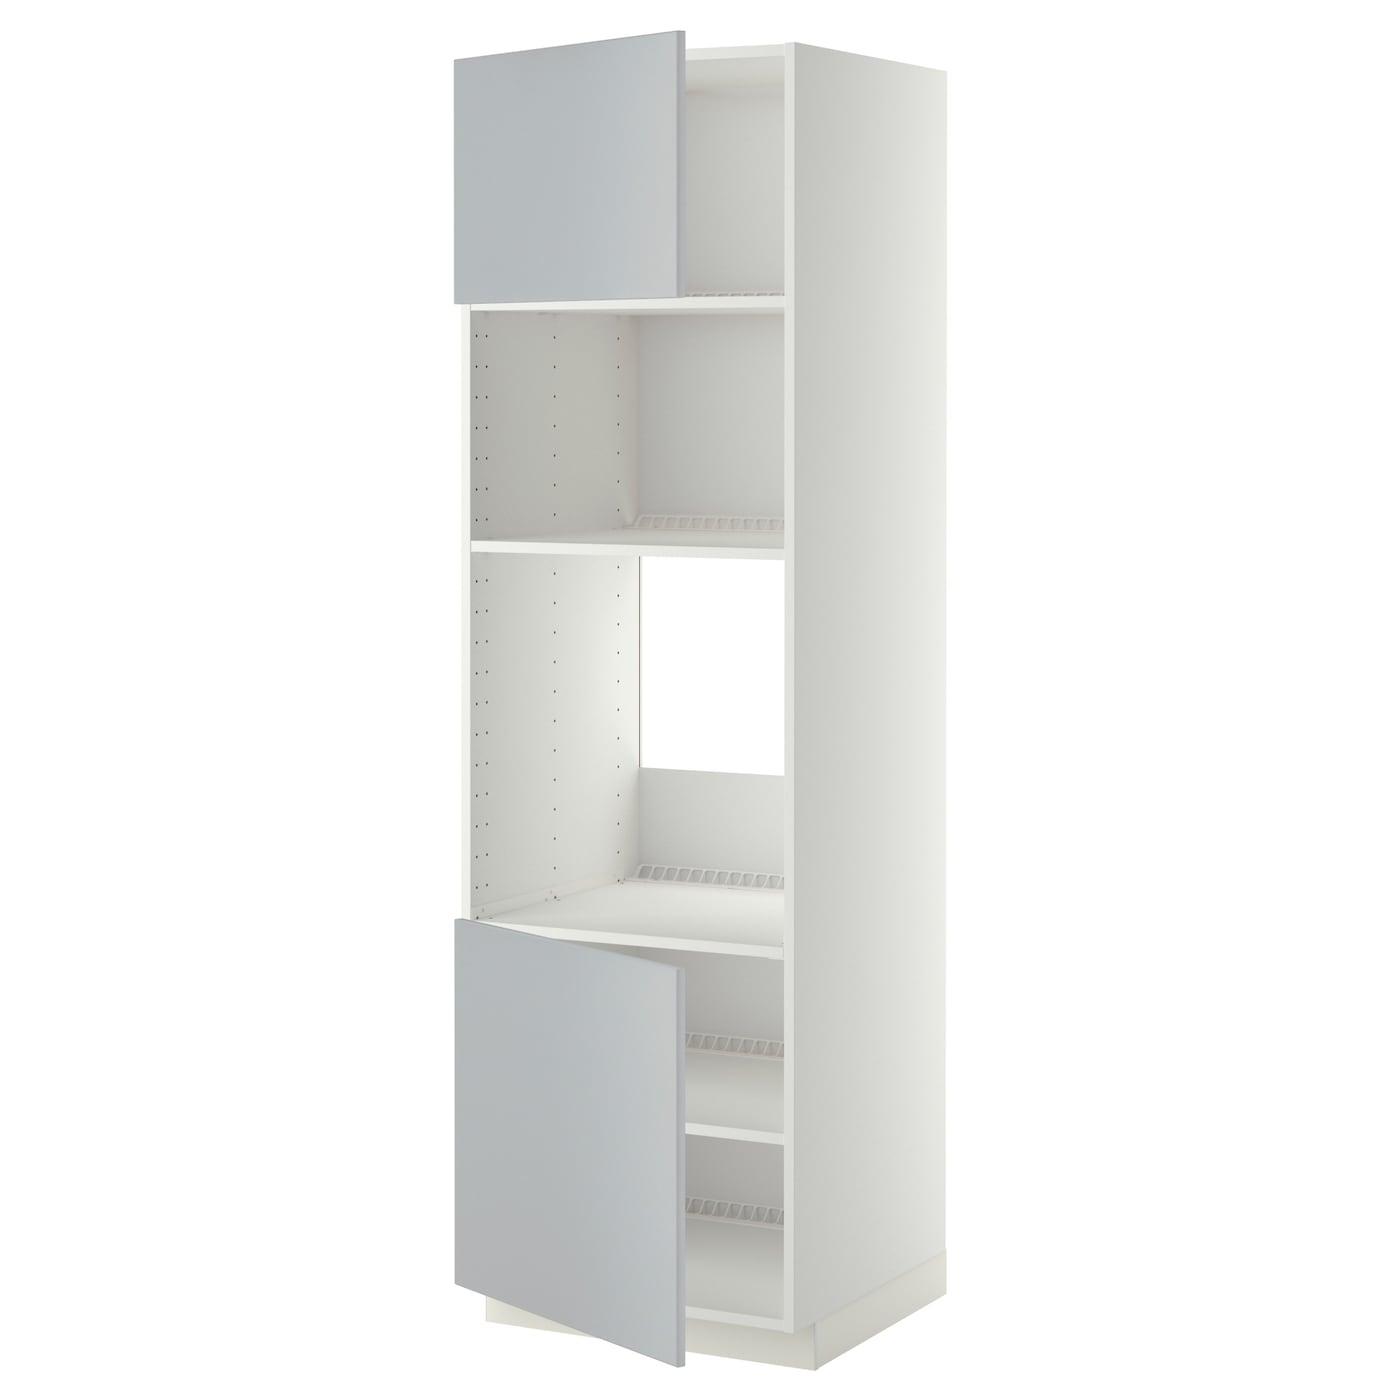 Metod hi cb f oven micro w 2 drs shelves white veddinge - Mobili x cucina ikea ...